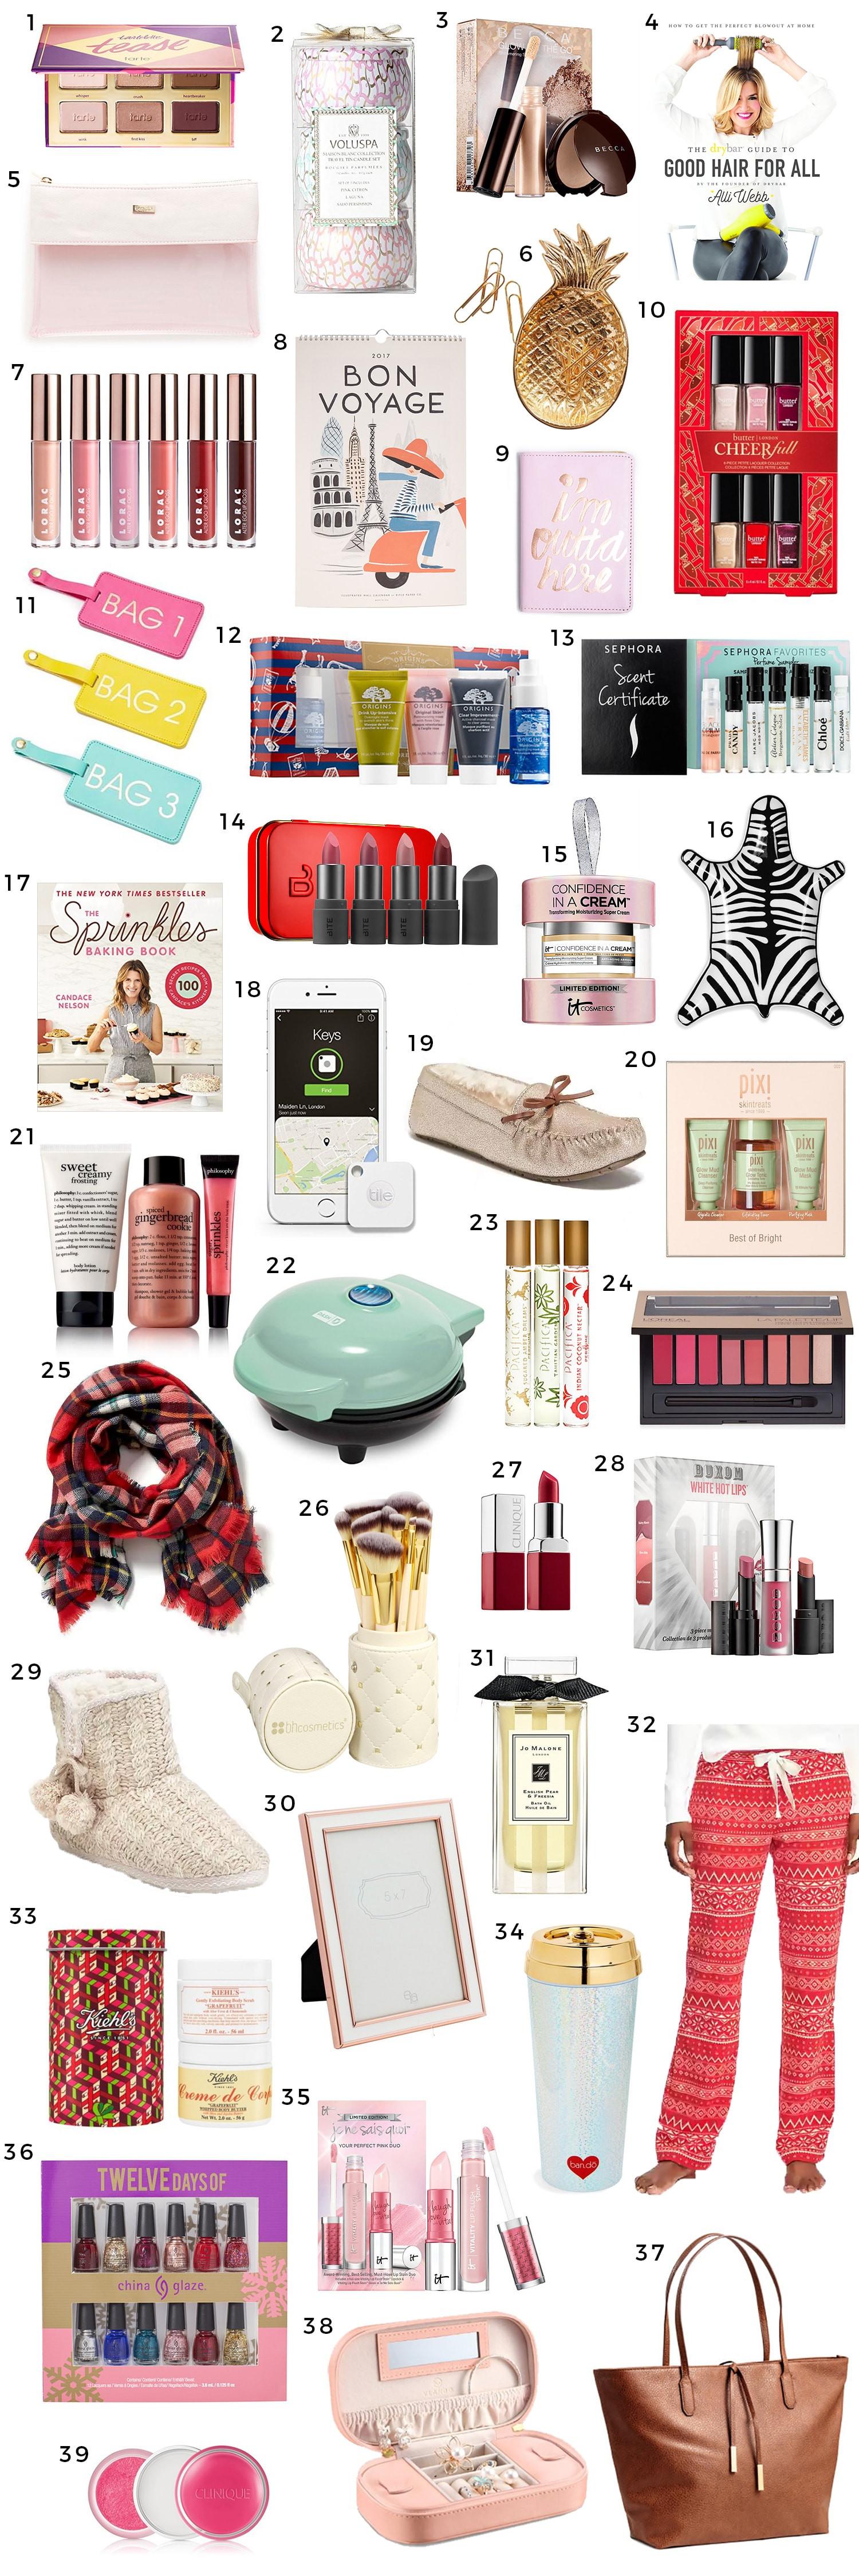 Best Christmas Gift Ideas  The Best Christmas Gift Ideas for Women under $25